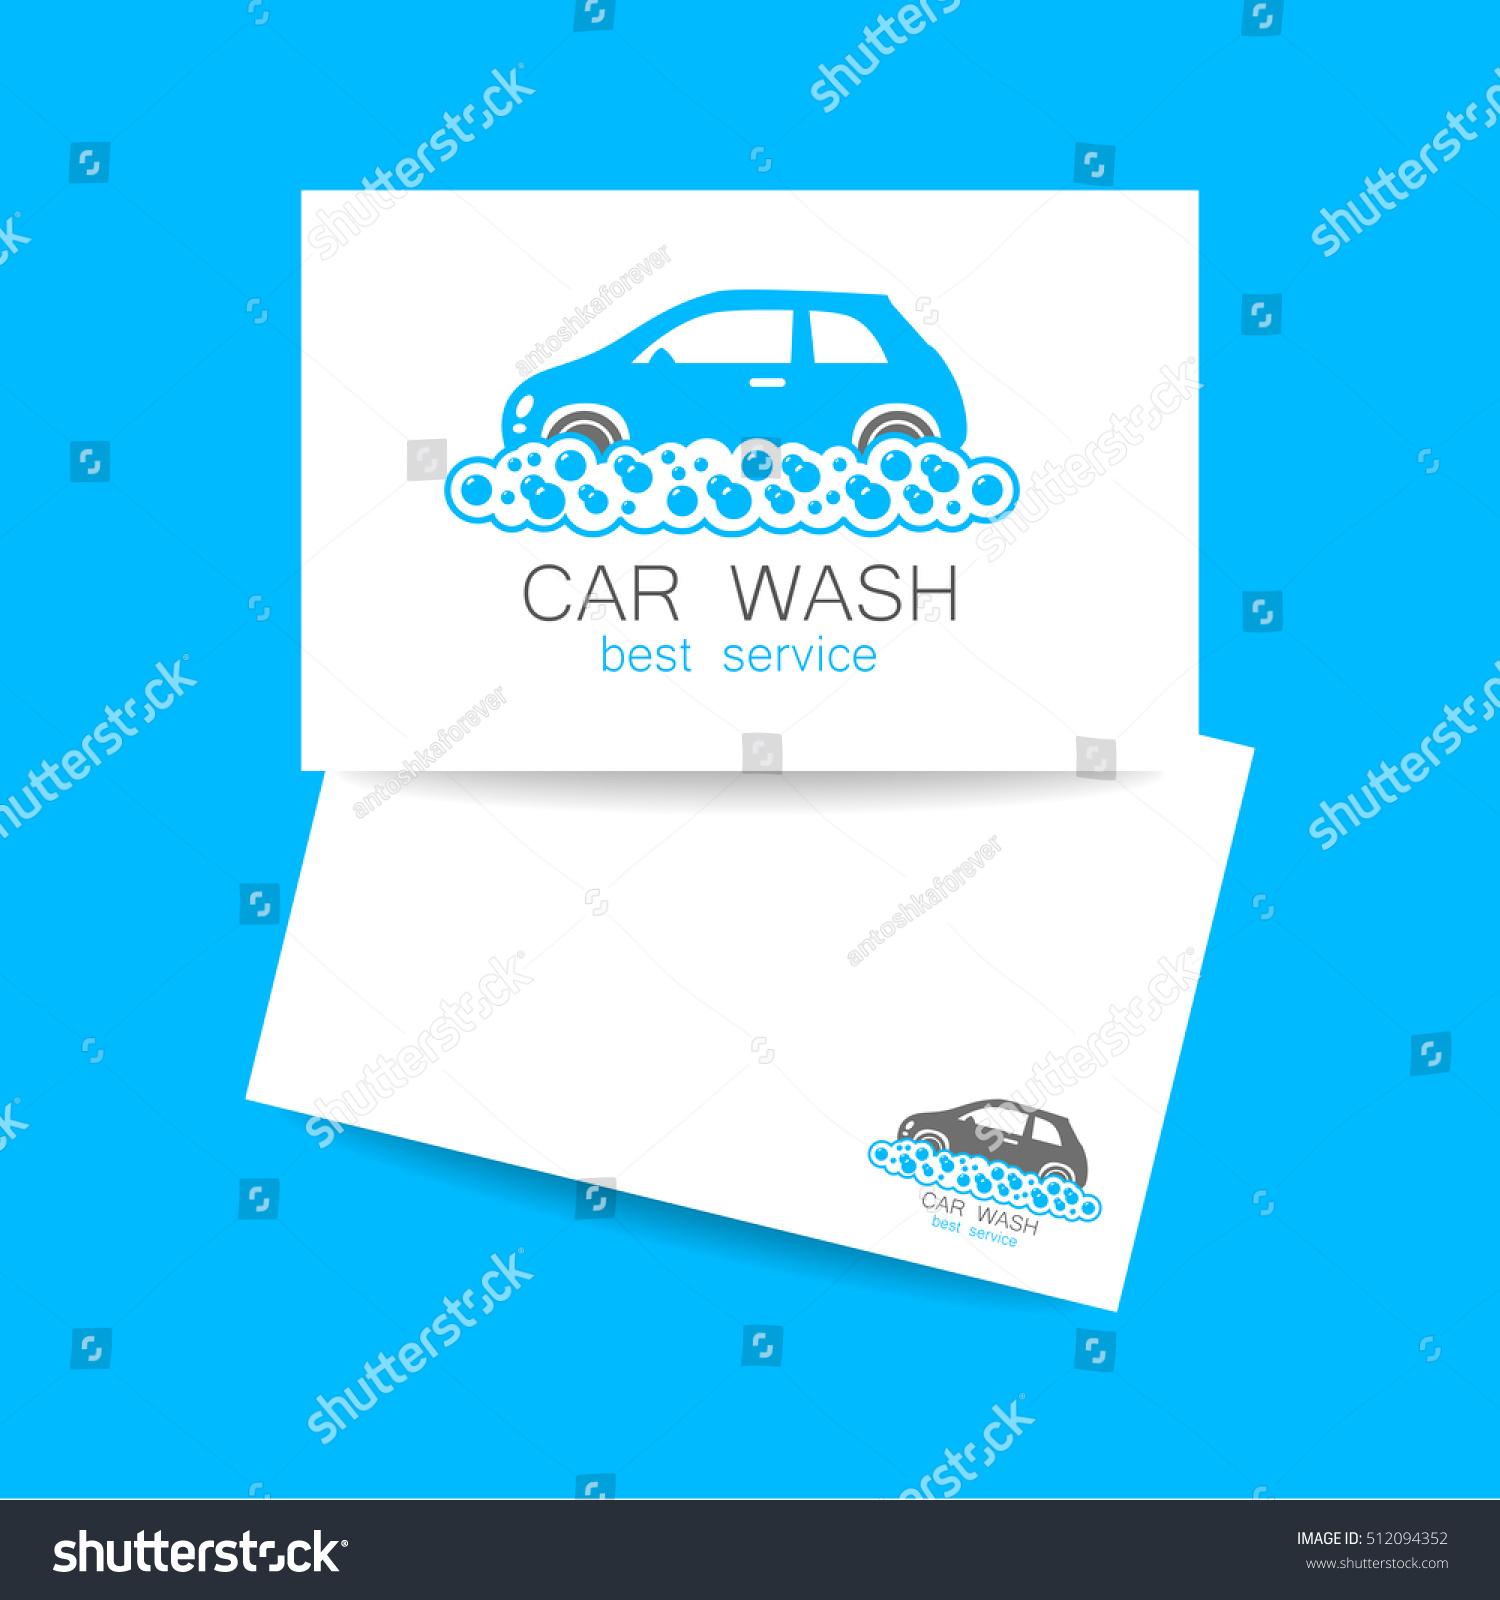 Magnificent Car Wash Business Card Ideas - Business Card Ideas ...